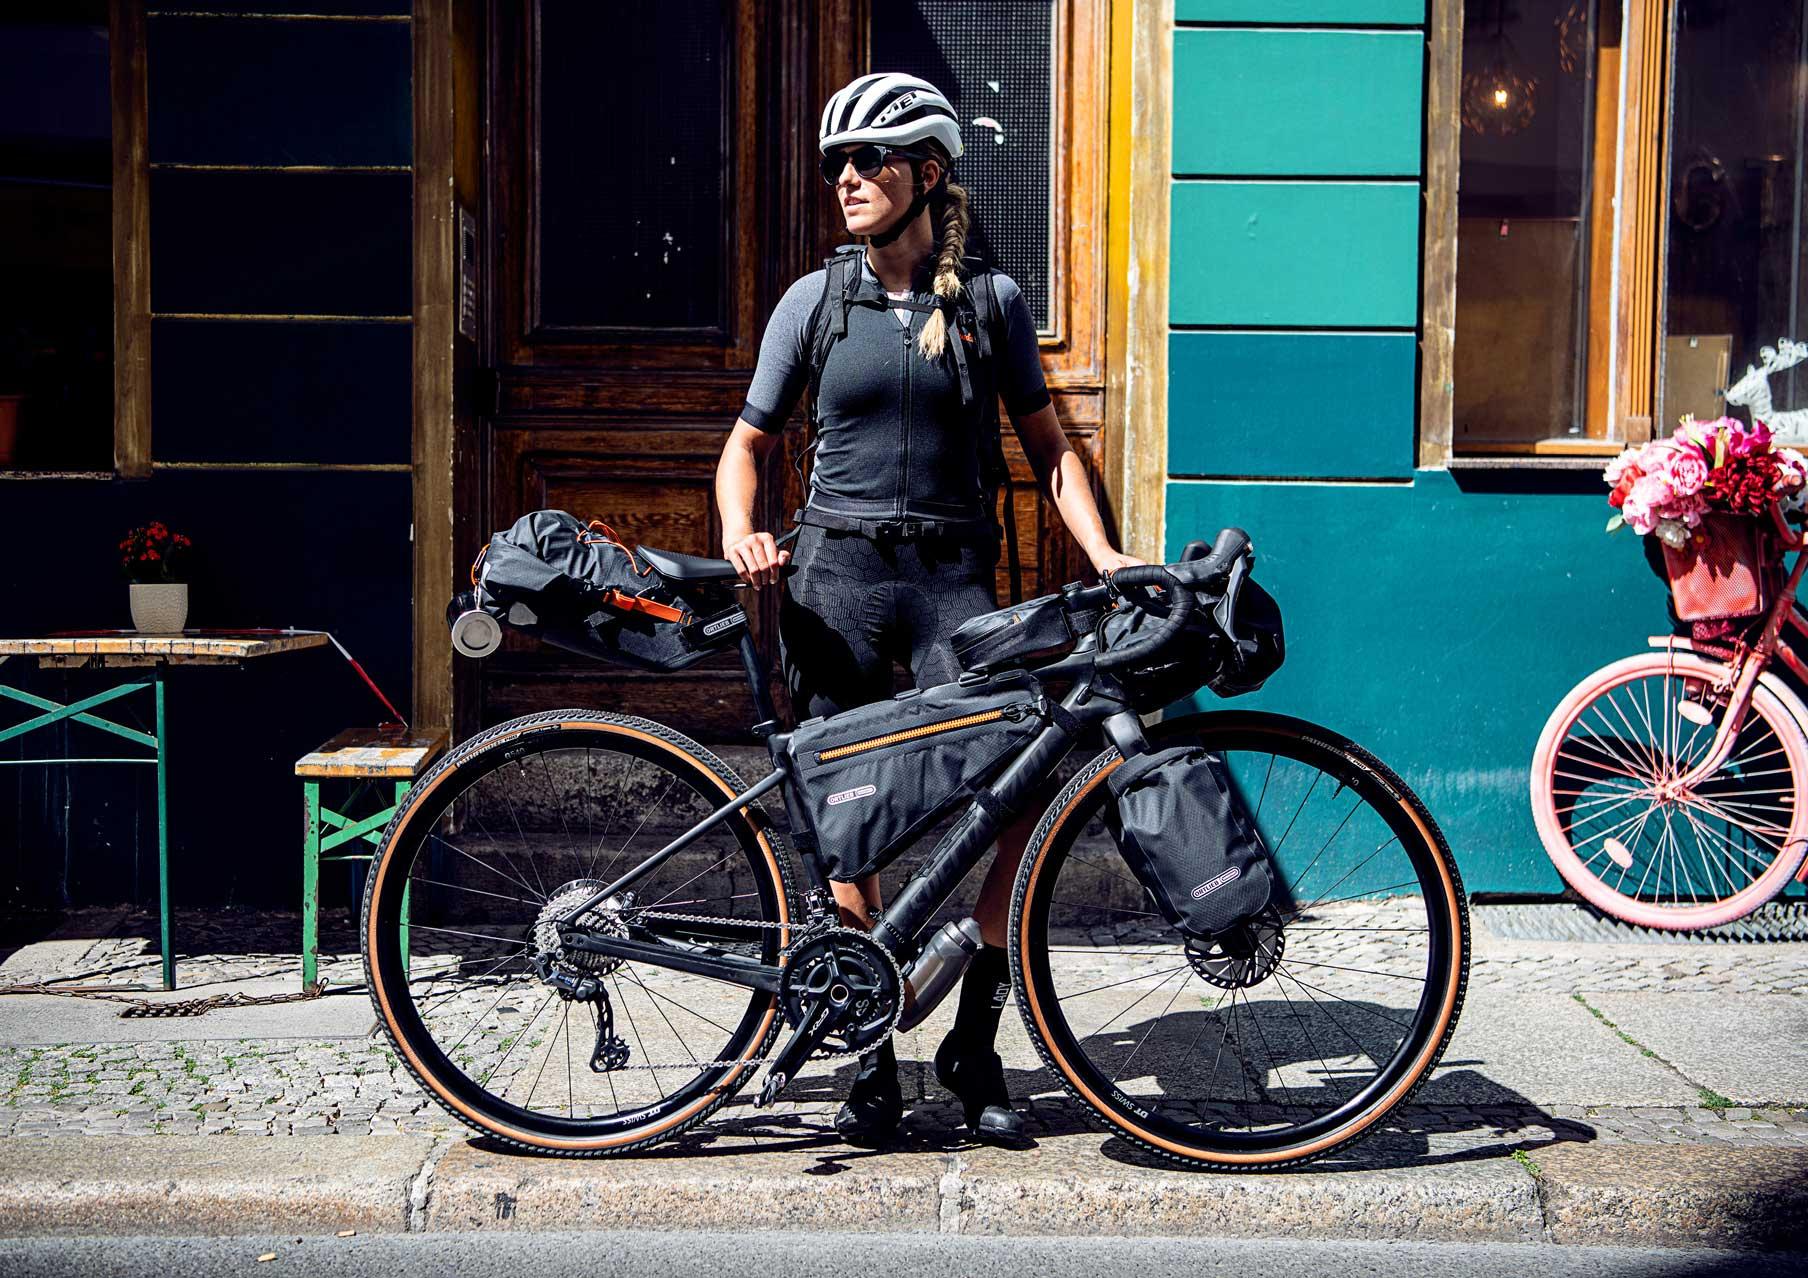 ORTLIEB_Bikepacking_Women_Credit_ORTLIEB